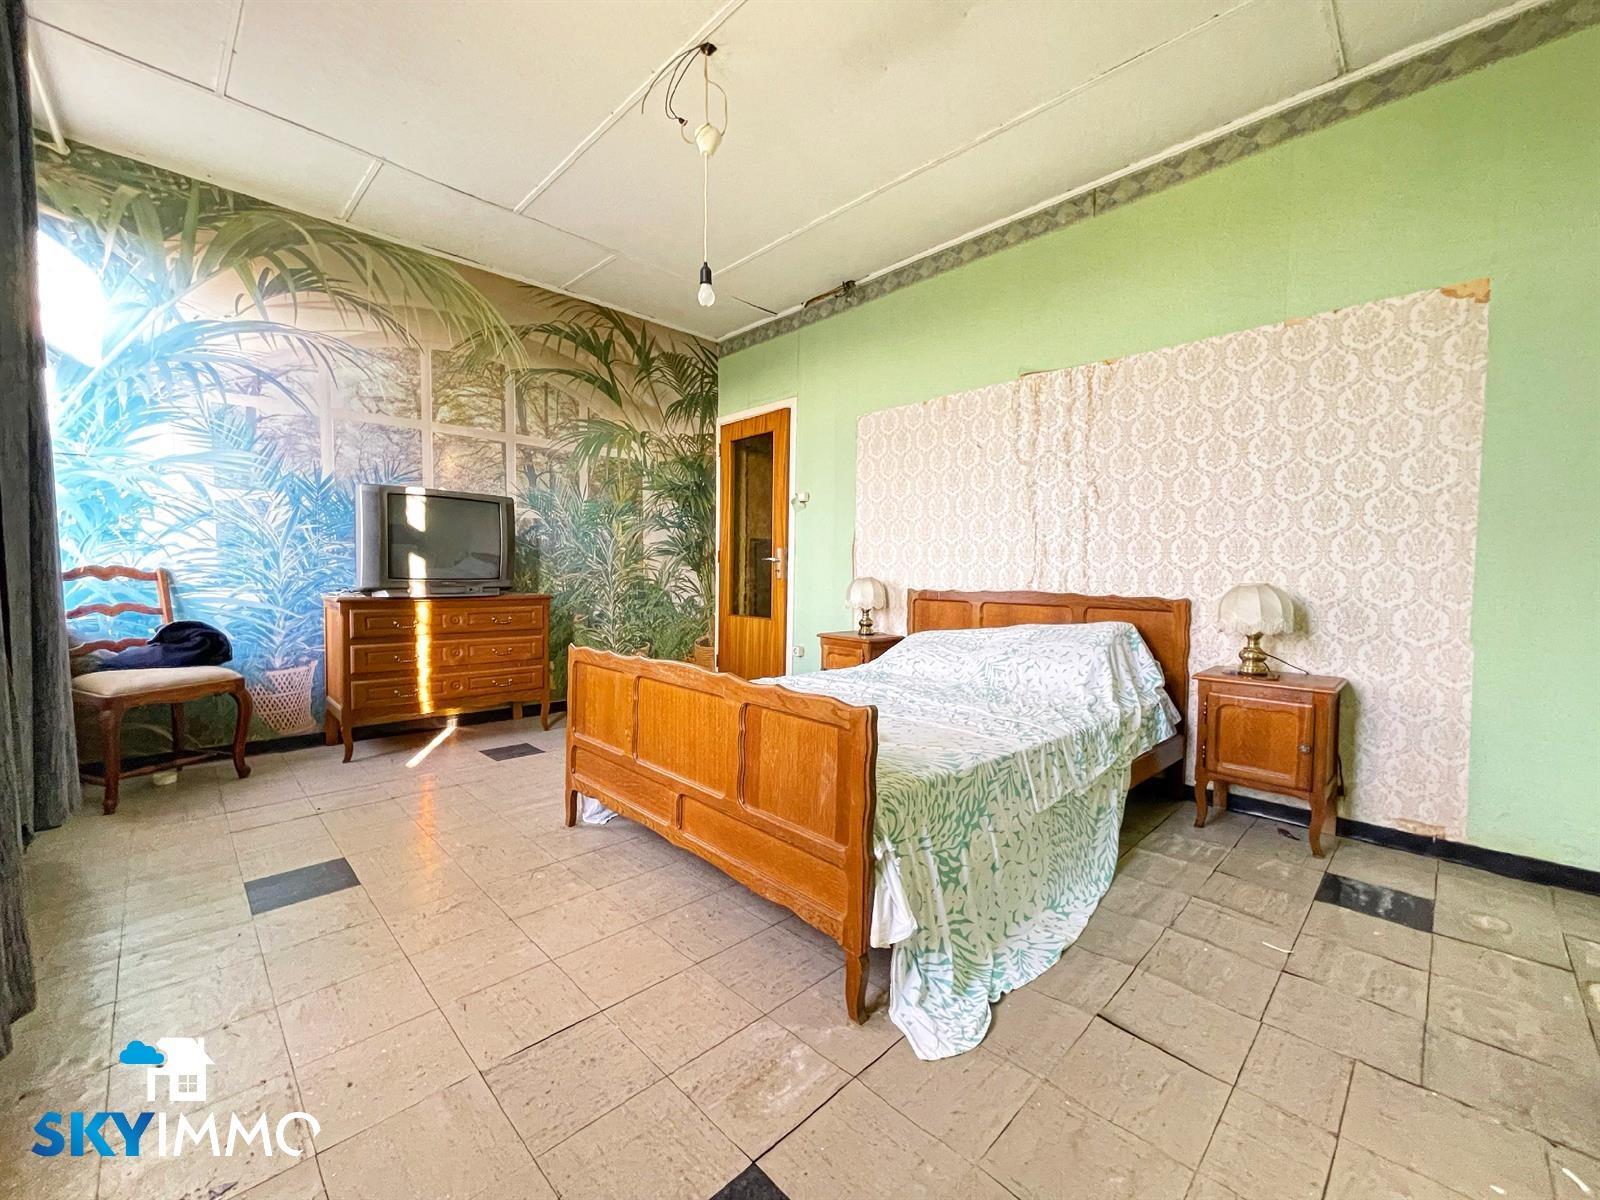 Maison - Seraing Jemeppesur-Meuse - #4383857-15